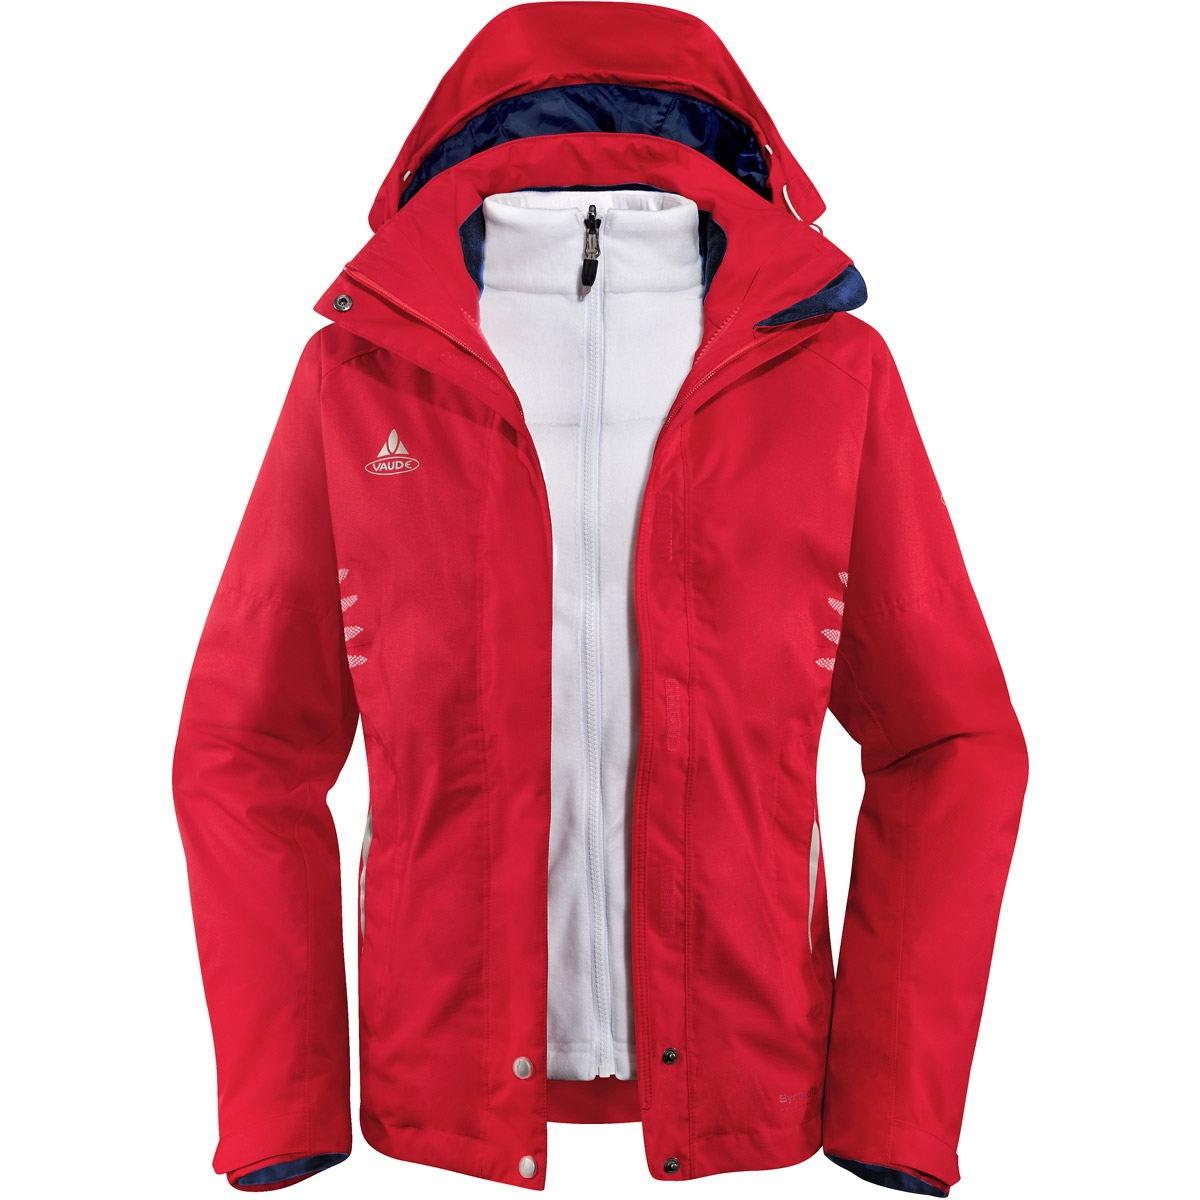 VAUDE  Sonderangebote –  Women's Vanoise 3in1 Jacket – Doppeljacke nun mit 40  % Rabatt für 179.95 € im Angebot